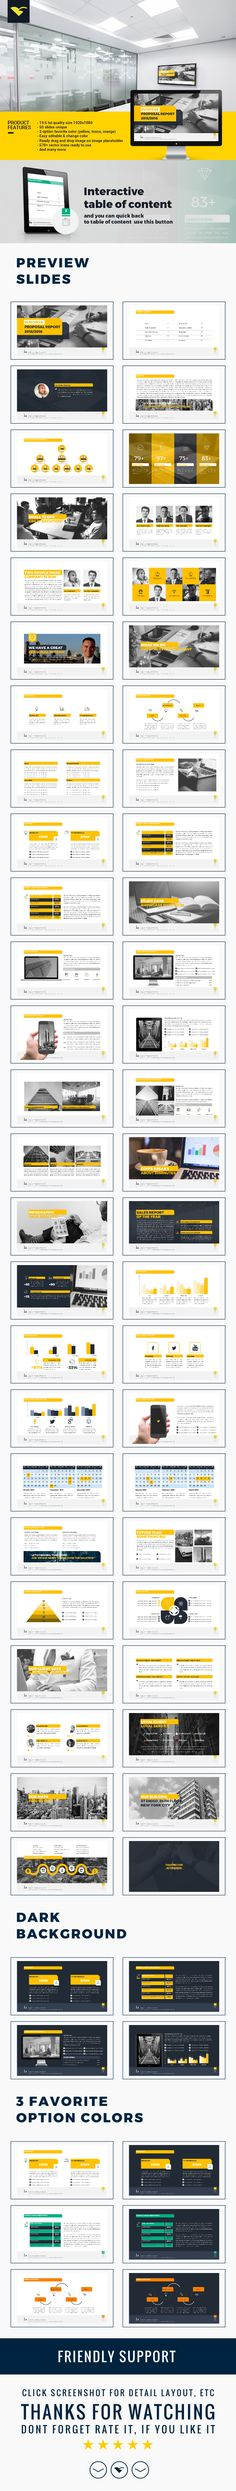 Business Annual Report PowerPoint Presentation Template #design #slides Download: http://graphicriver.net/item/business-annual-report-powerpoint-presentation/13363139?ref=ksioks